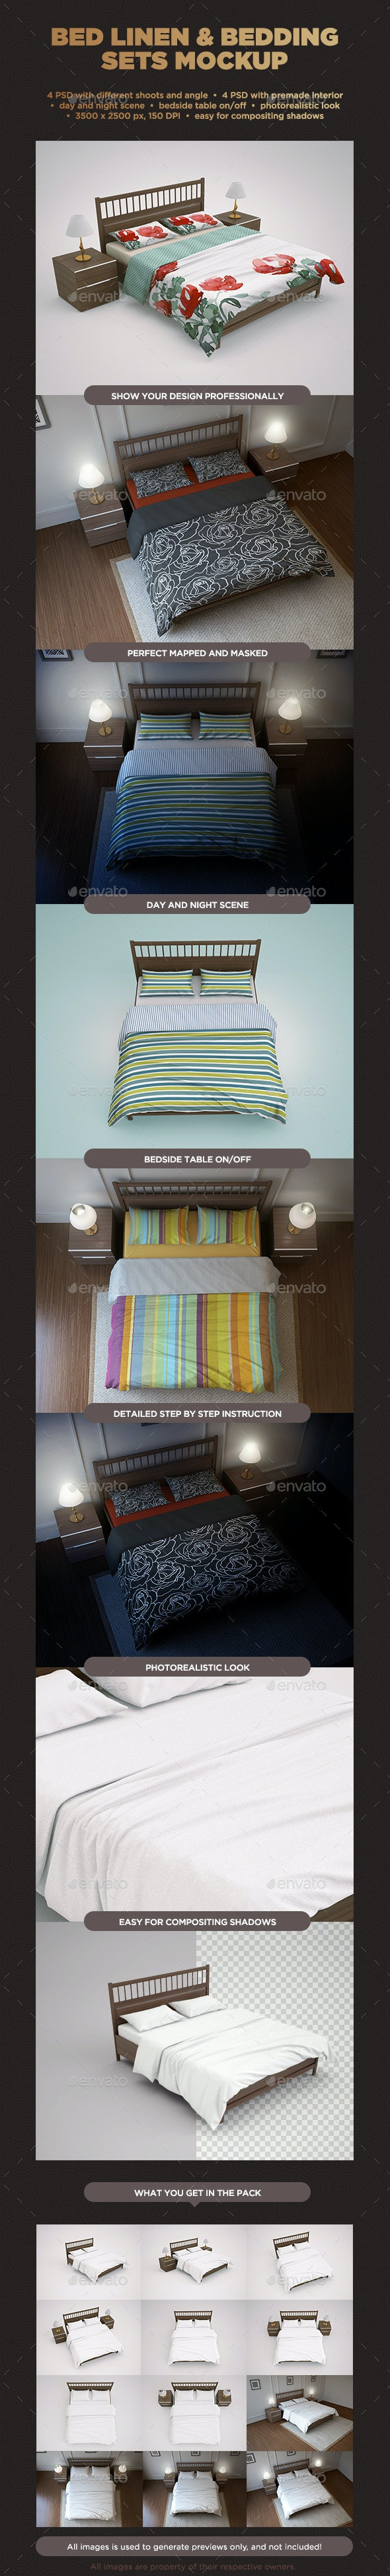 Bed Linen & Bedding Sets Mockup - Miscellaneous Print